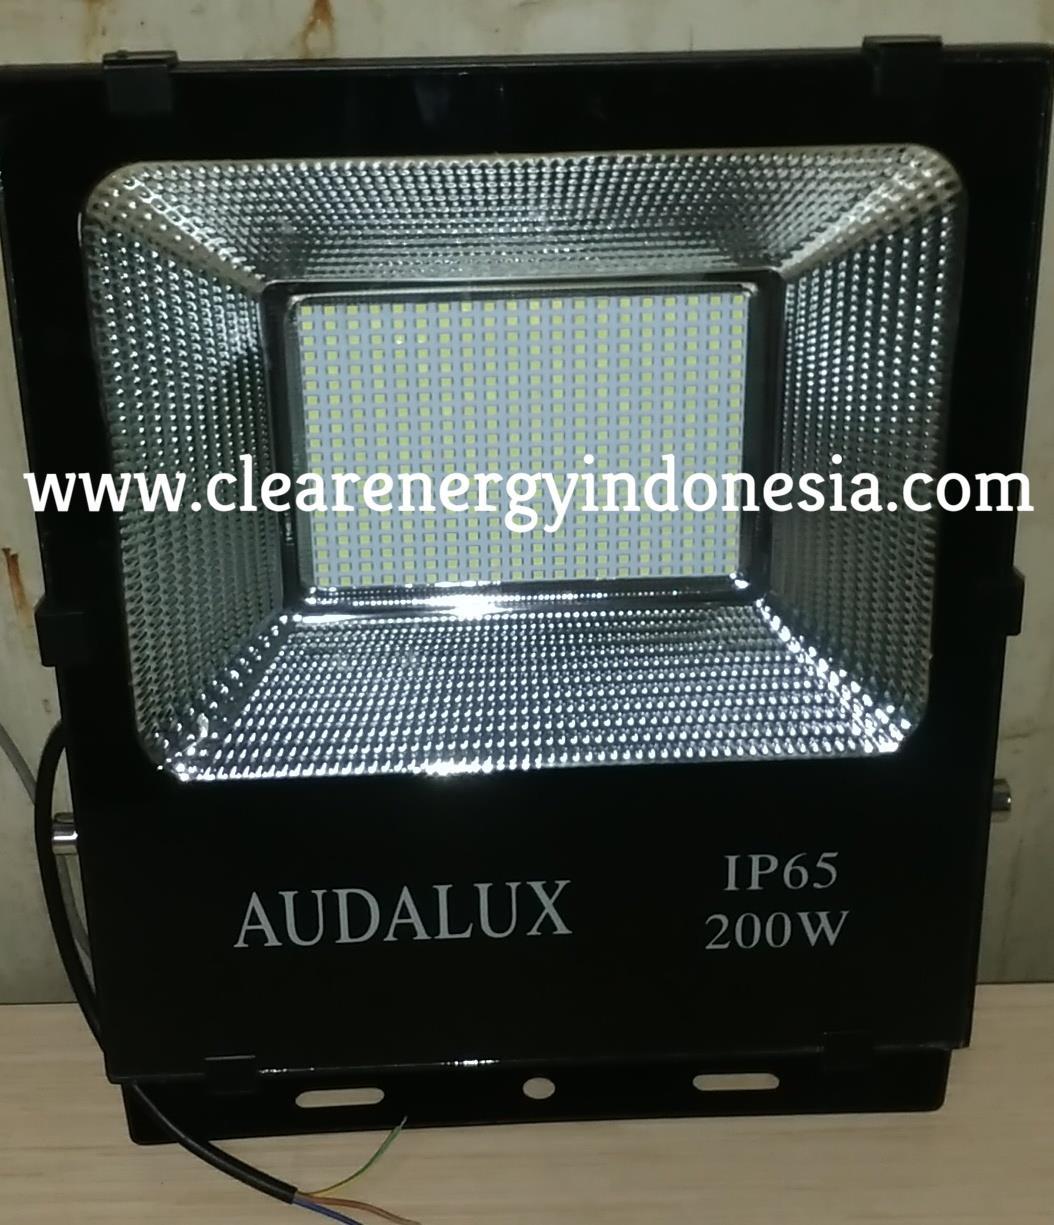 Jual Lampu Sorot LED / Flood Light Audalux- 200Watt Harga